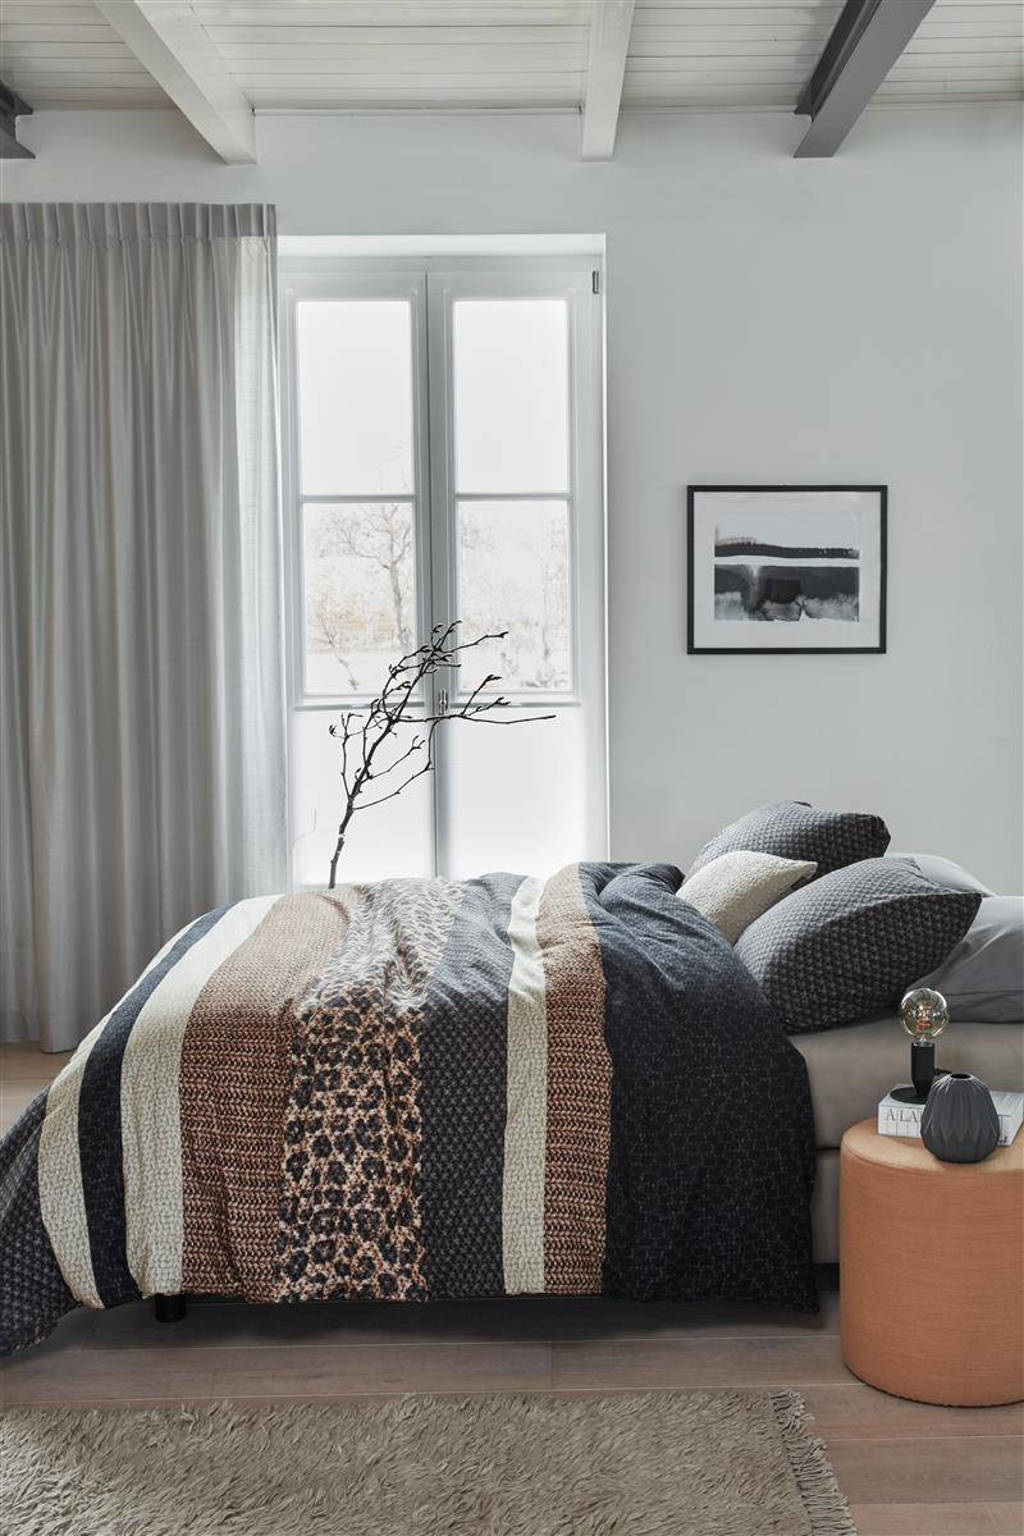 Beddinghouse flanellen dekbedovertrek lits-jumeaux, Lits-jumeaux (240 cm breed), Grijs